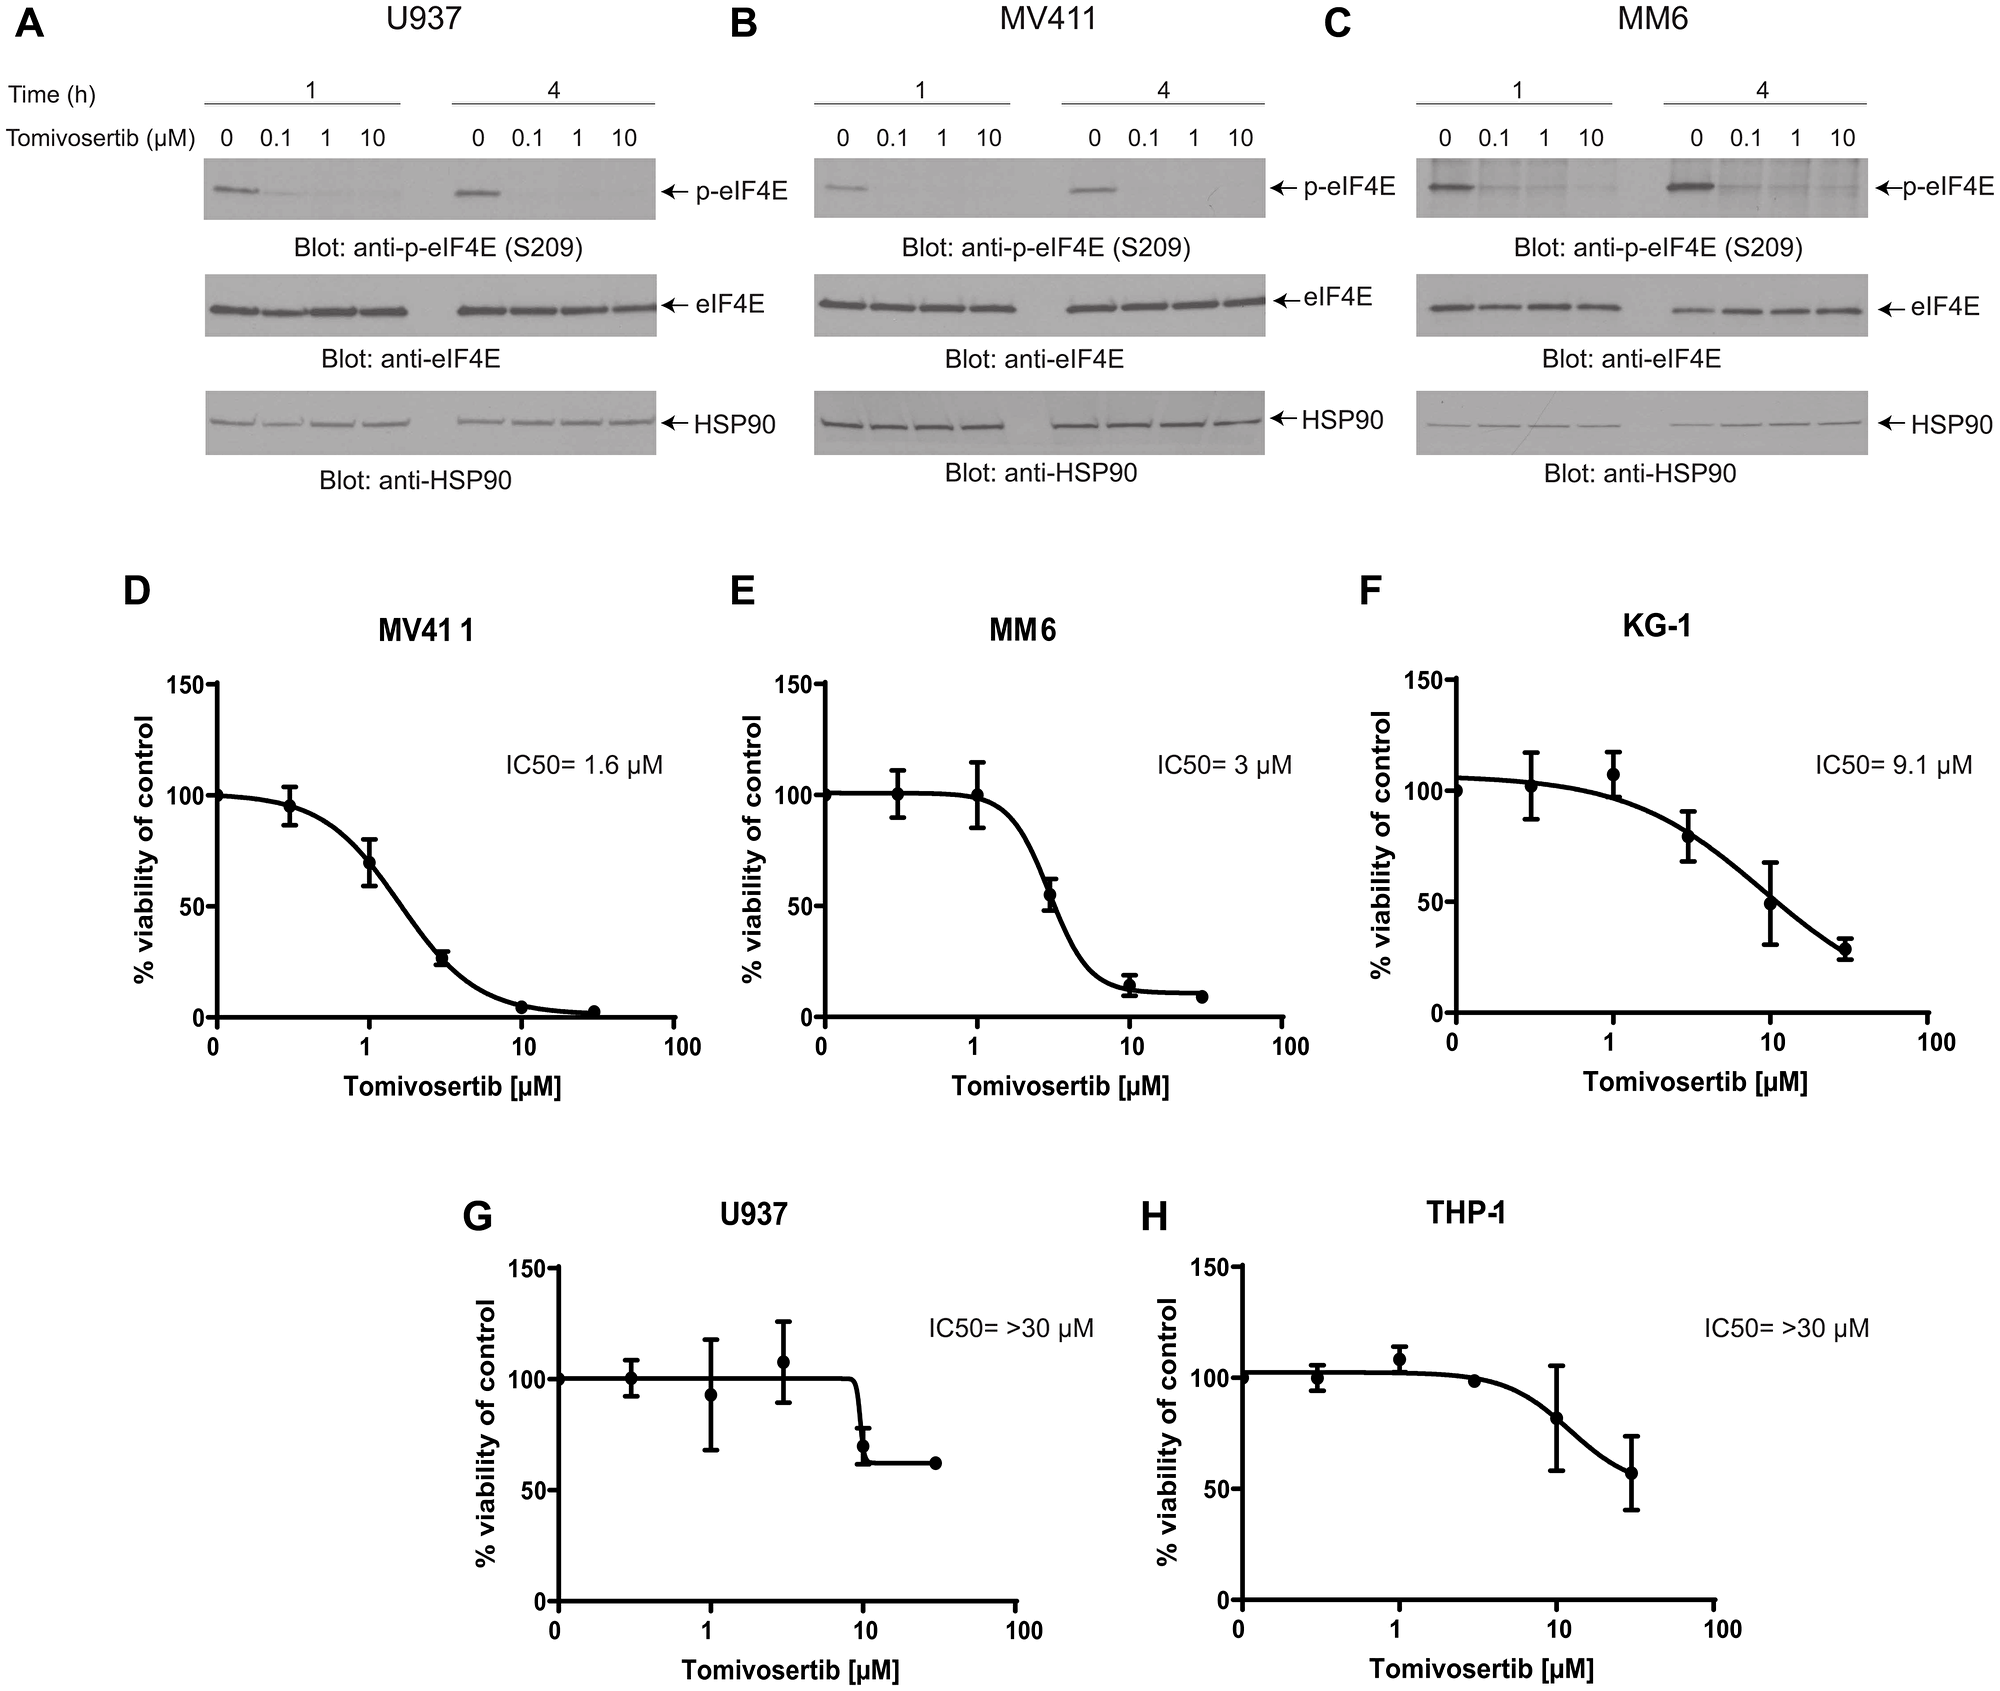 Tomivosertib blocks phosphorylation of eIF4E at Ser209 and inhibits cell viability in AML cells.